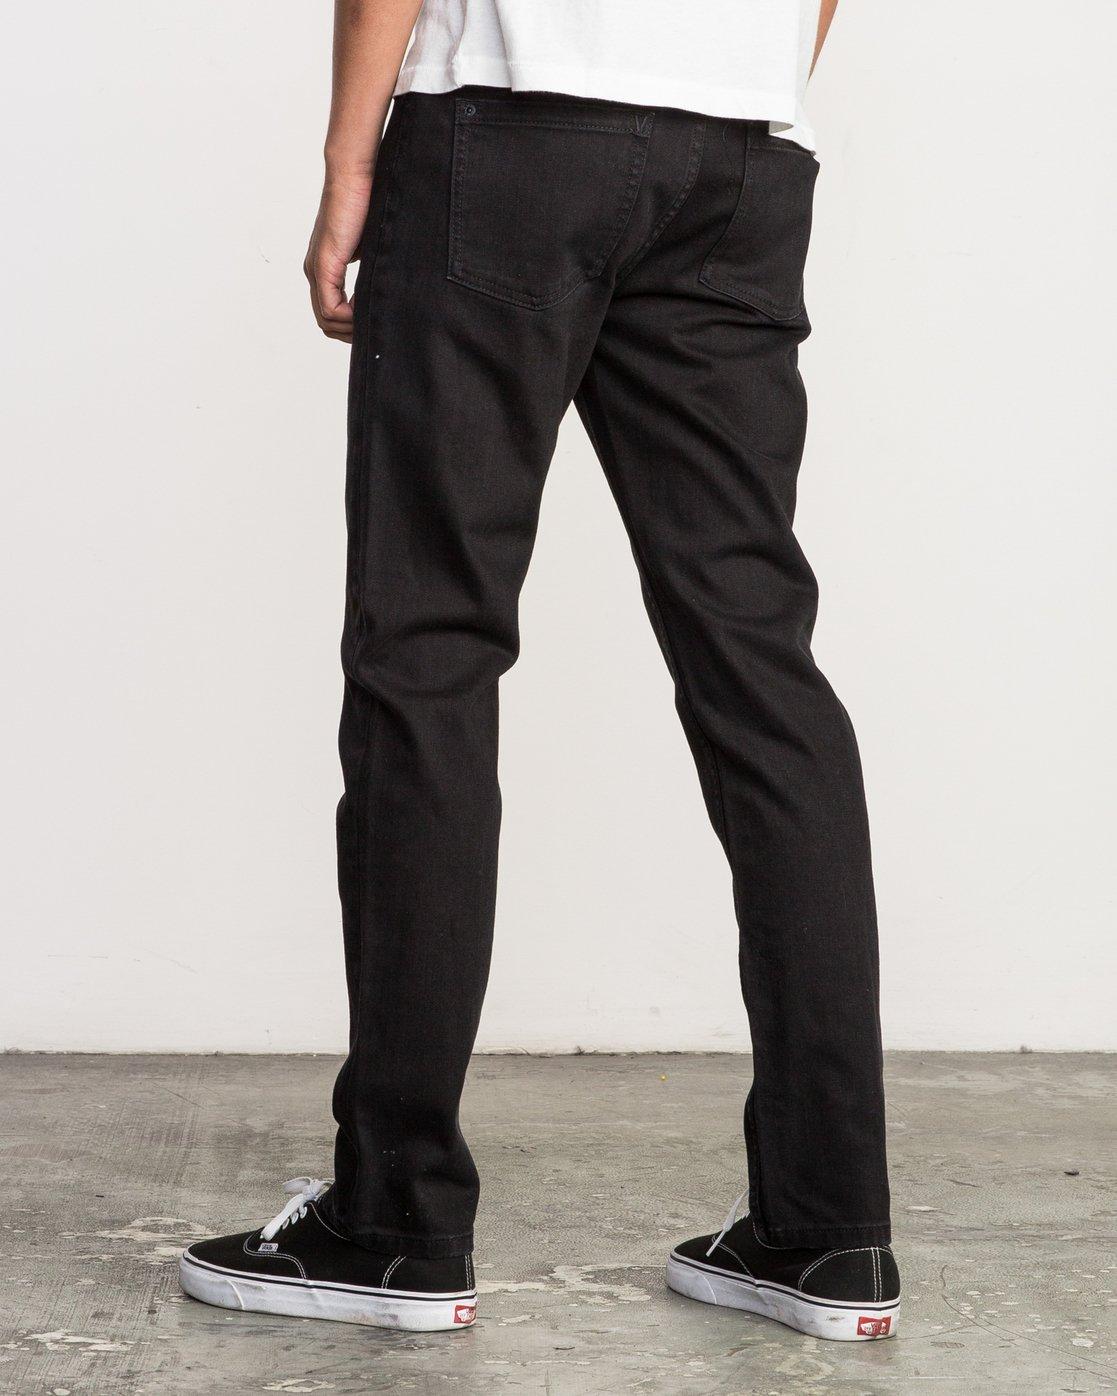 Fit Hexed Fit Fit Slim Jeans Slim Hexed Denim Denim Jeans Slim Hexed dBCoerx